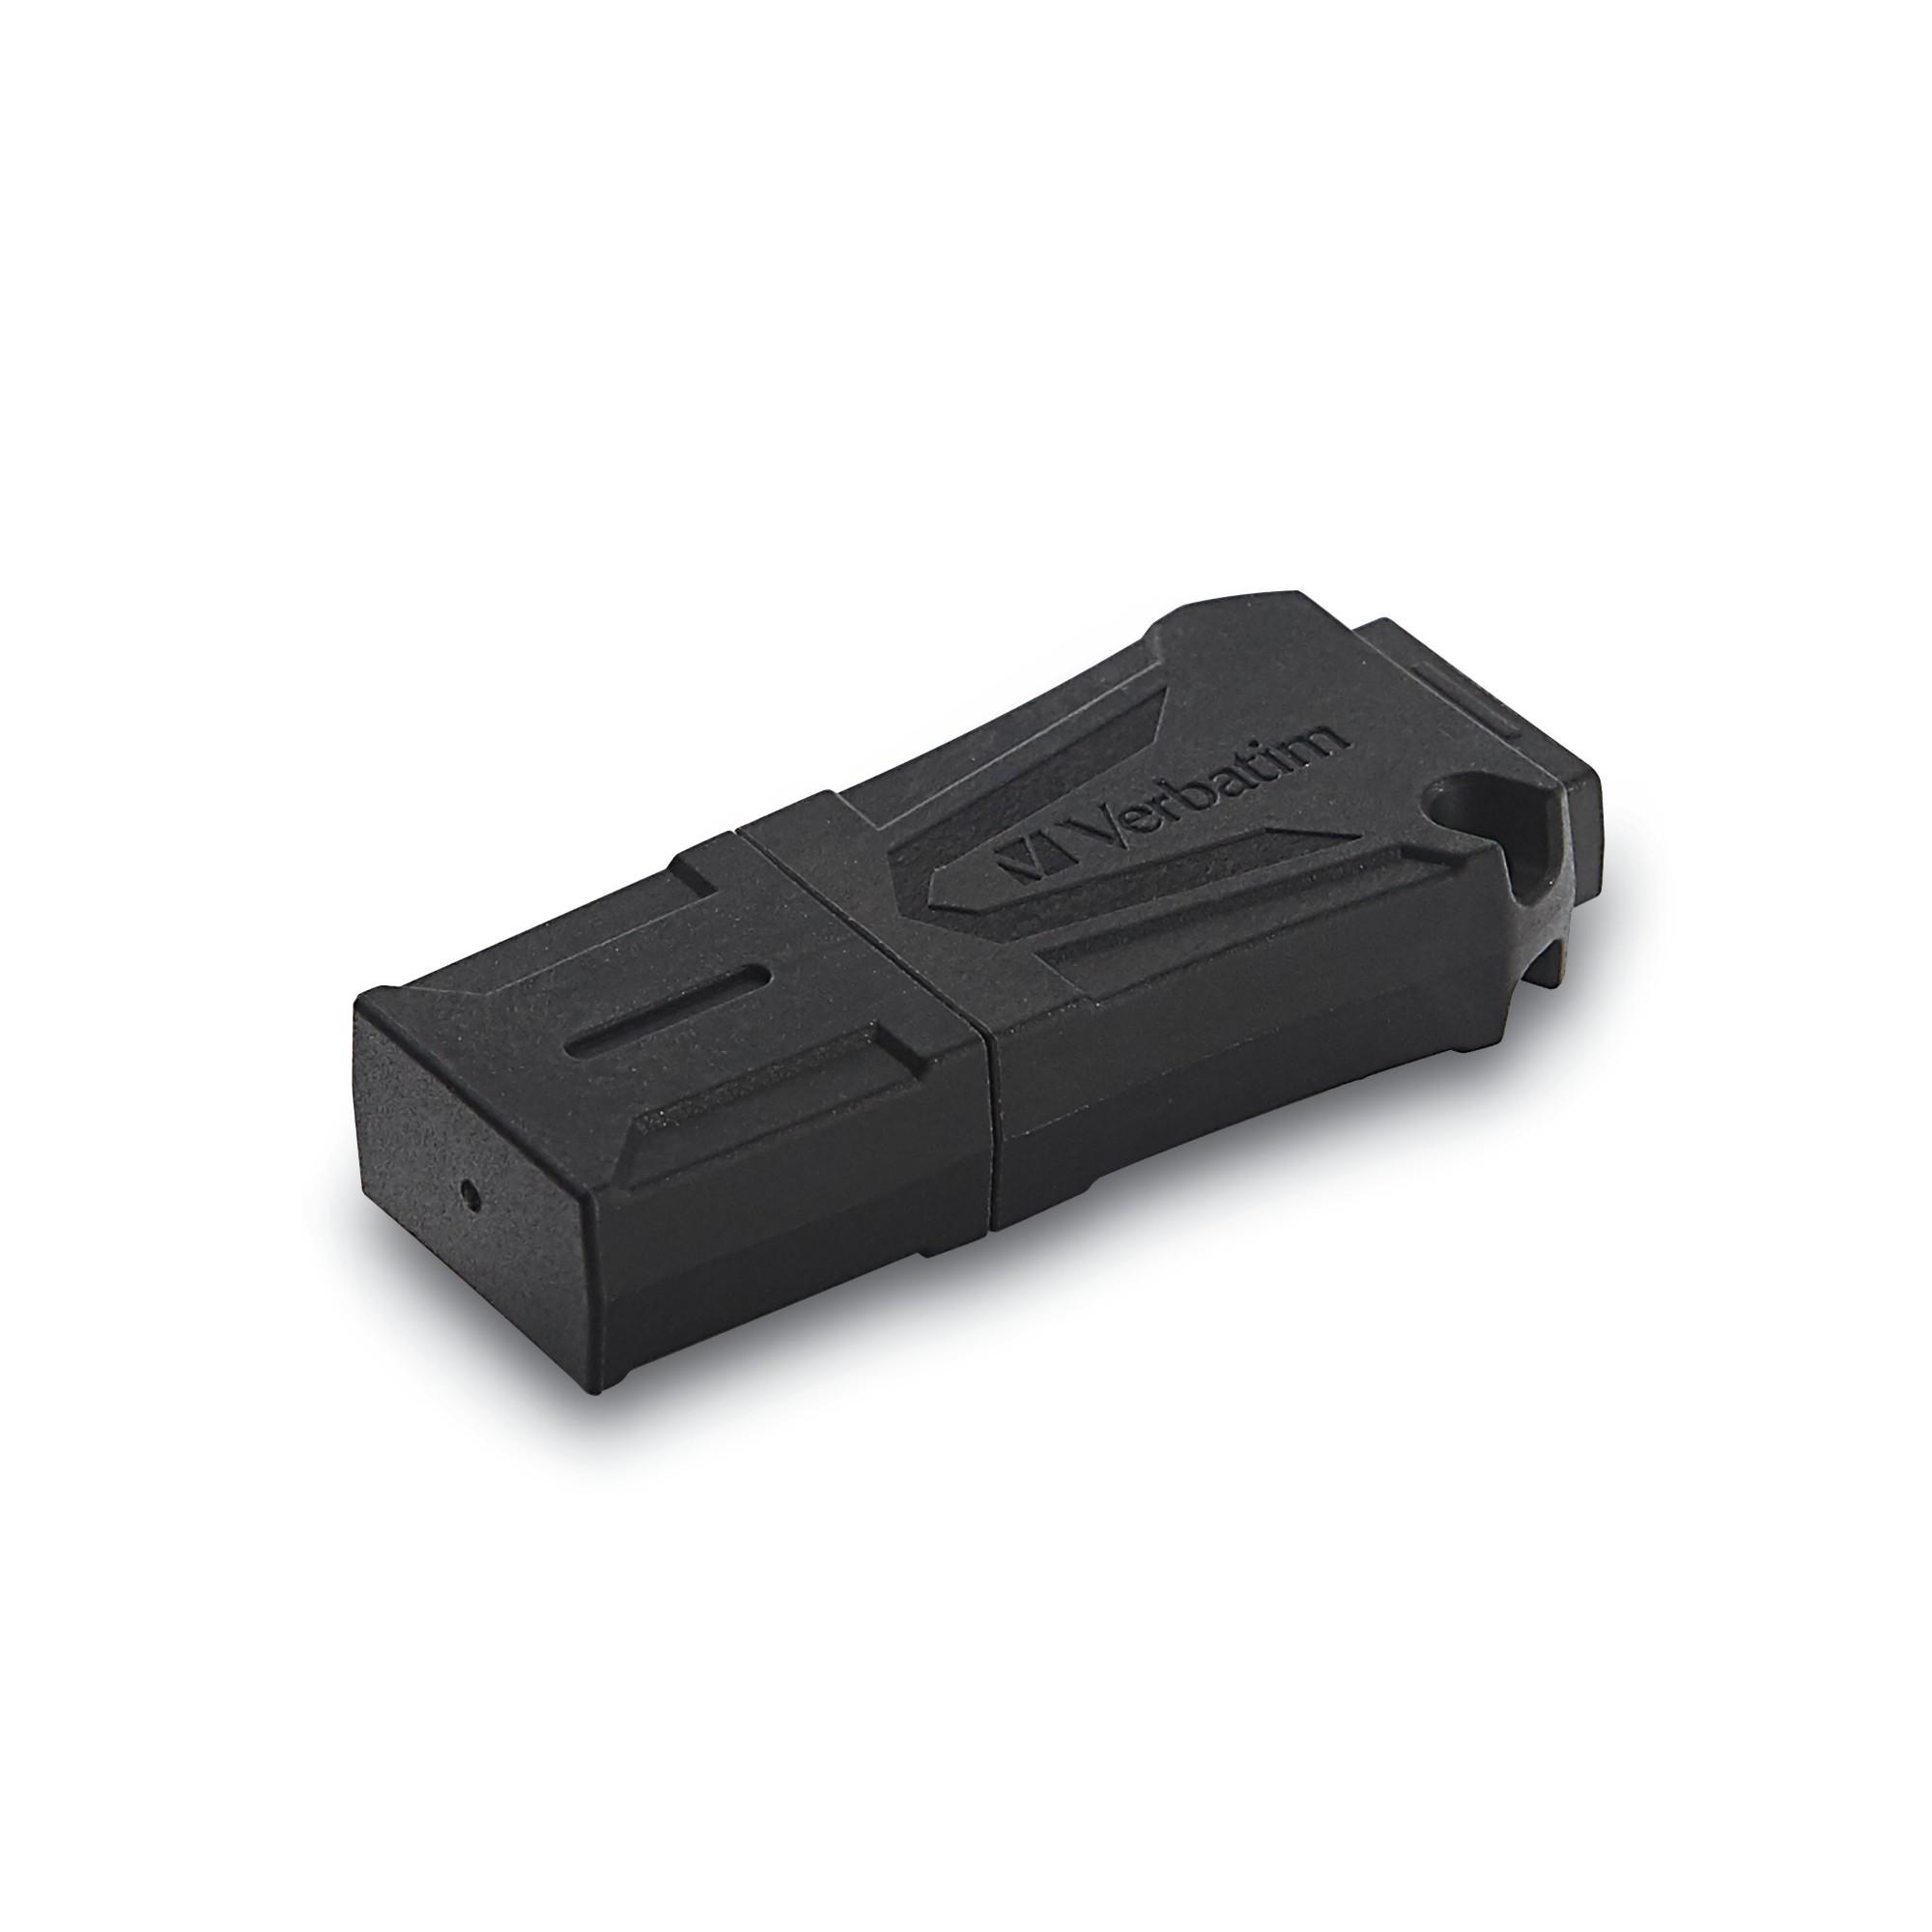 Verbatim ToughMAX USB flash drive 32 GB USB Type-A 2.0 Black